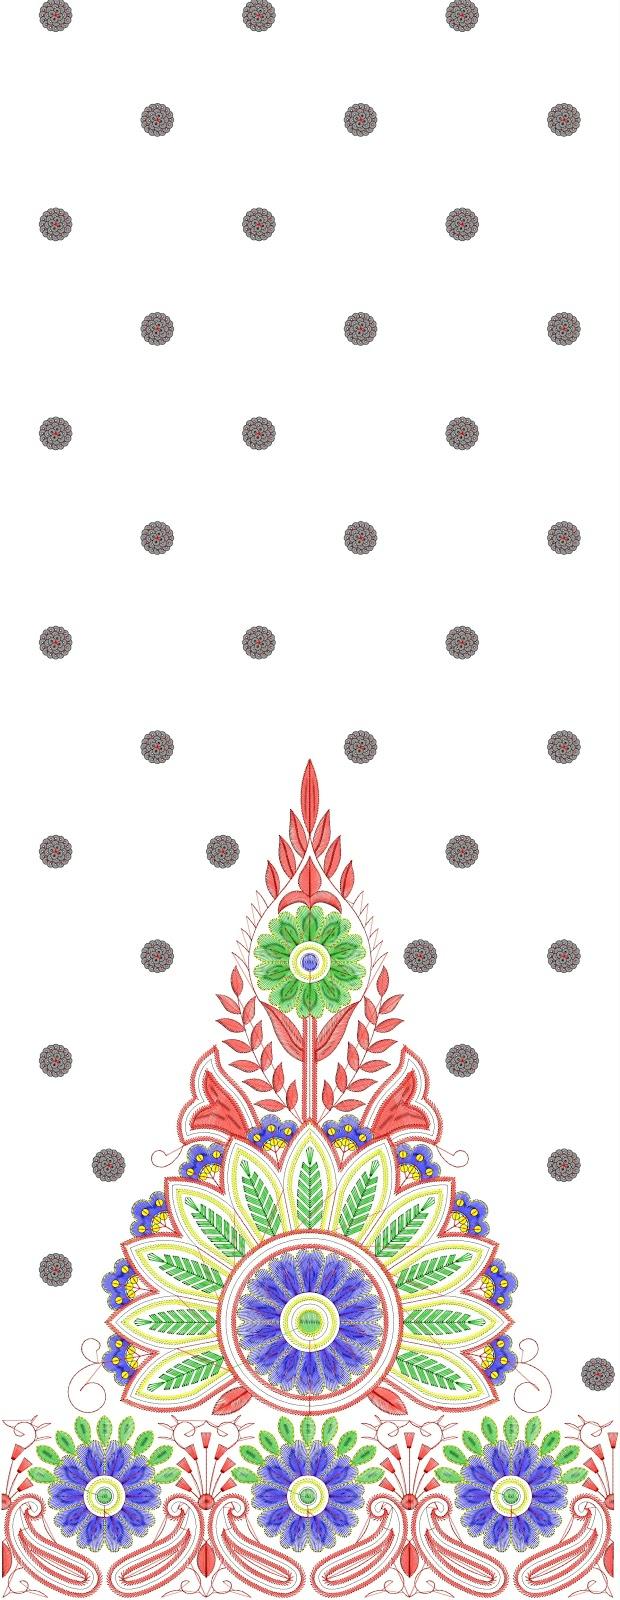 Excellent zari embroidery designs makaroka